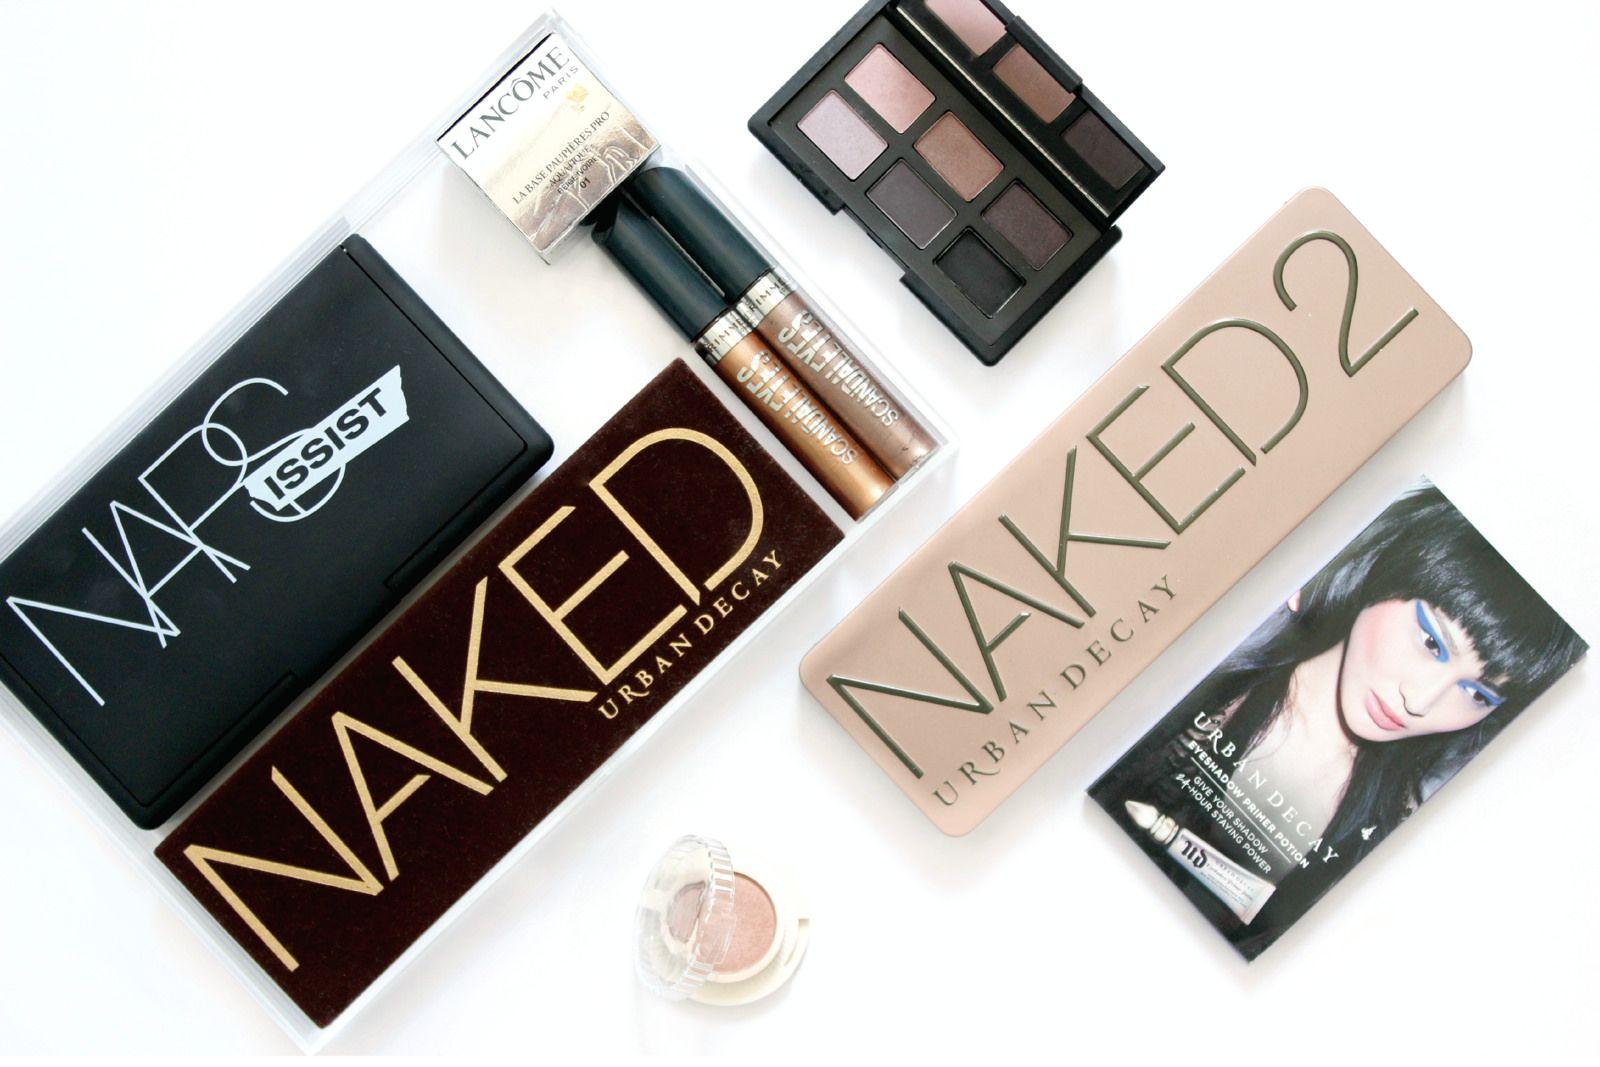 The Muji Files Part 2 #bbloggers #Makeup #Storage